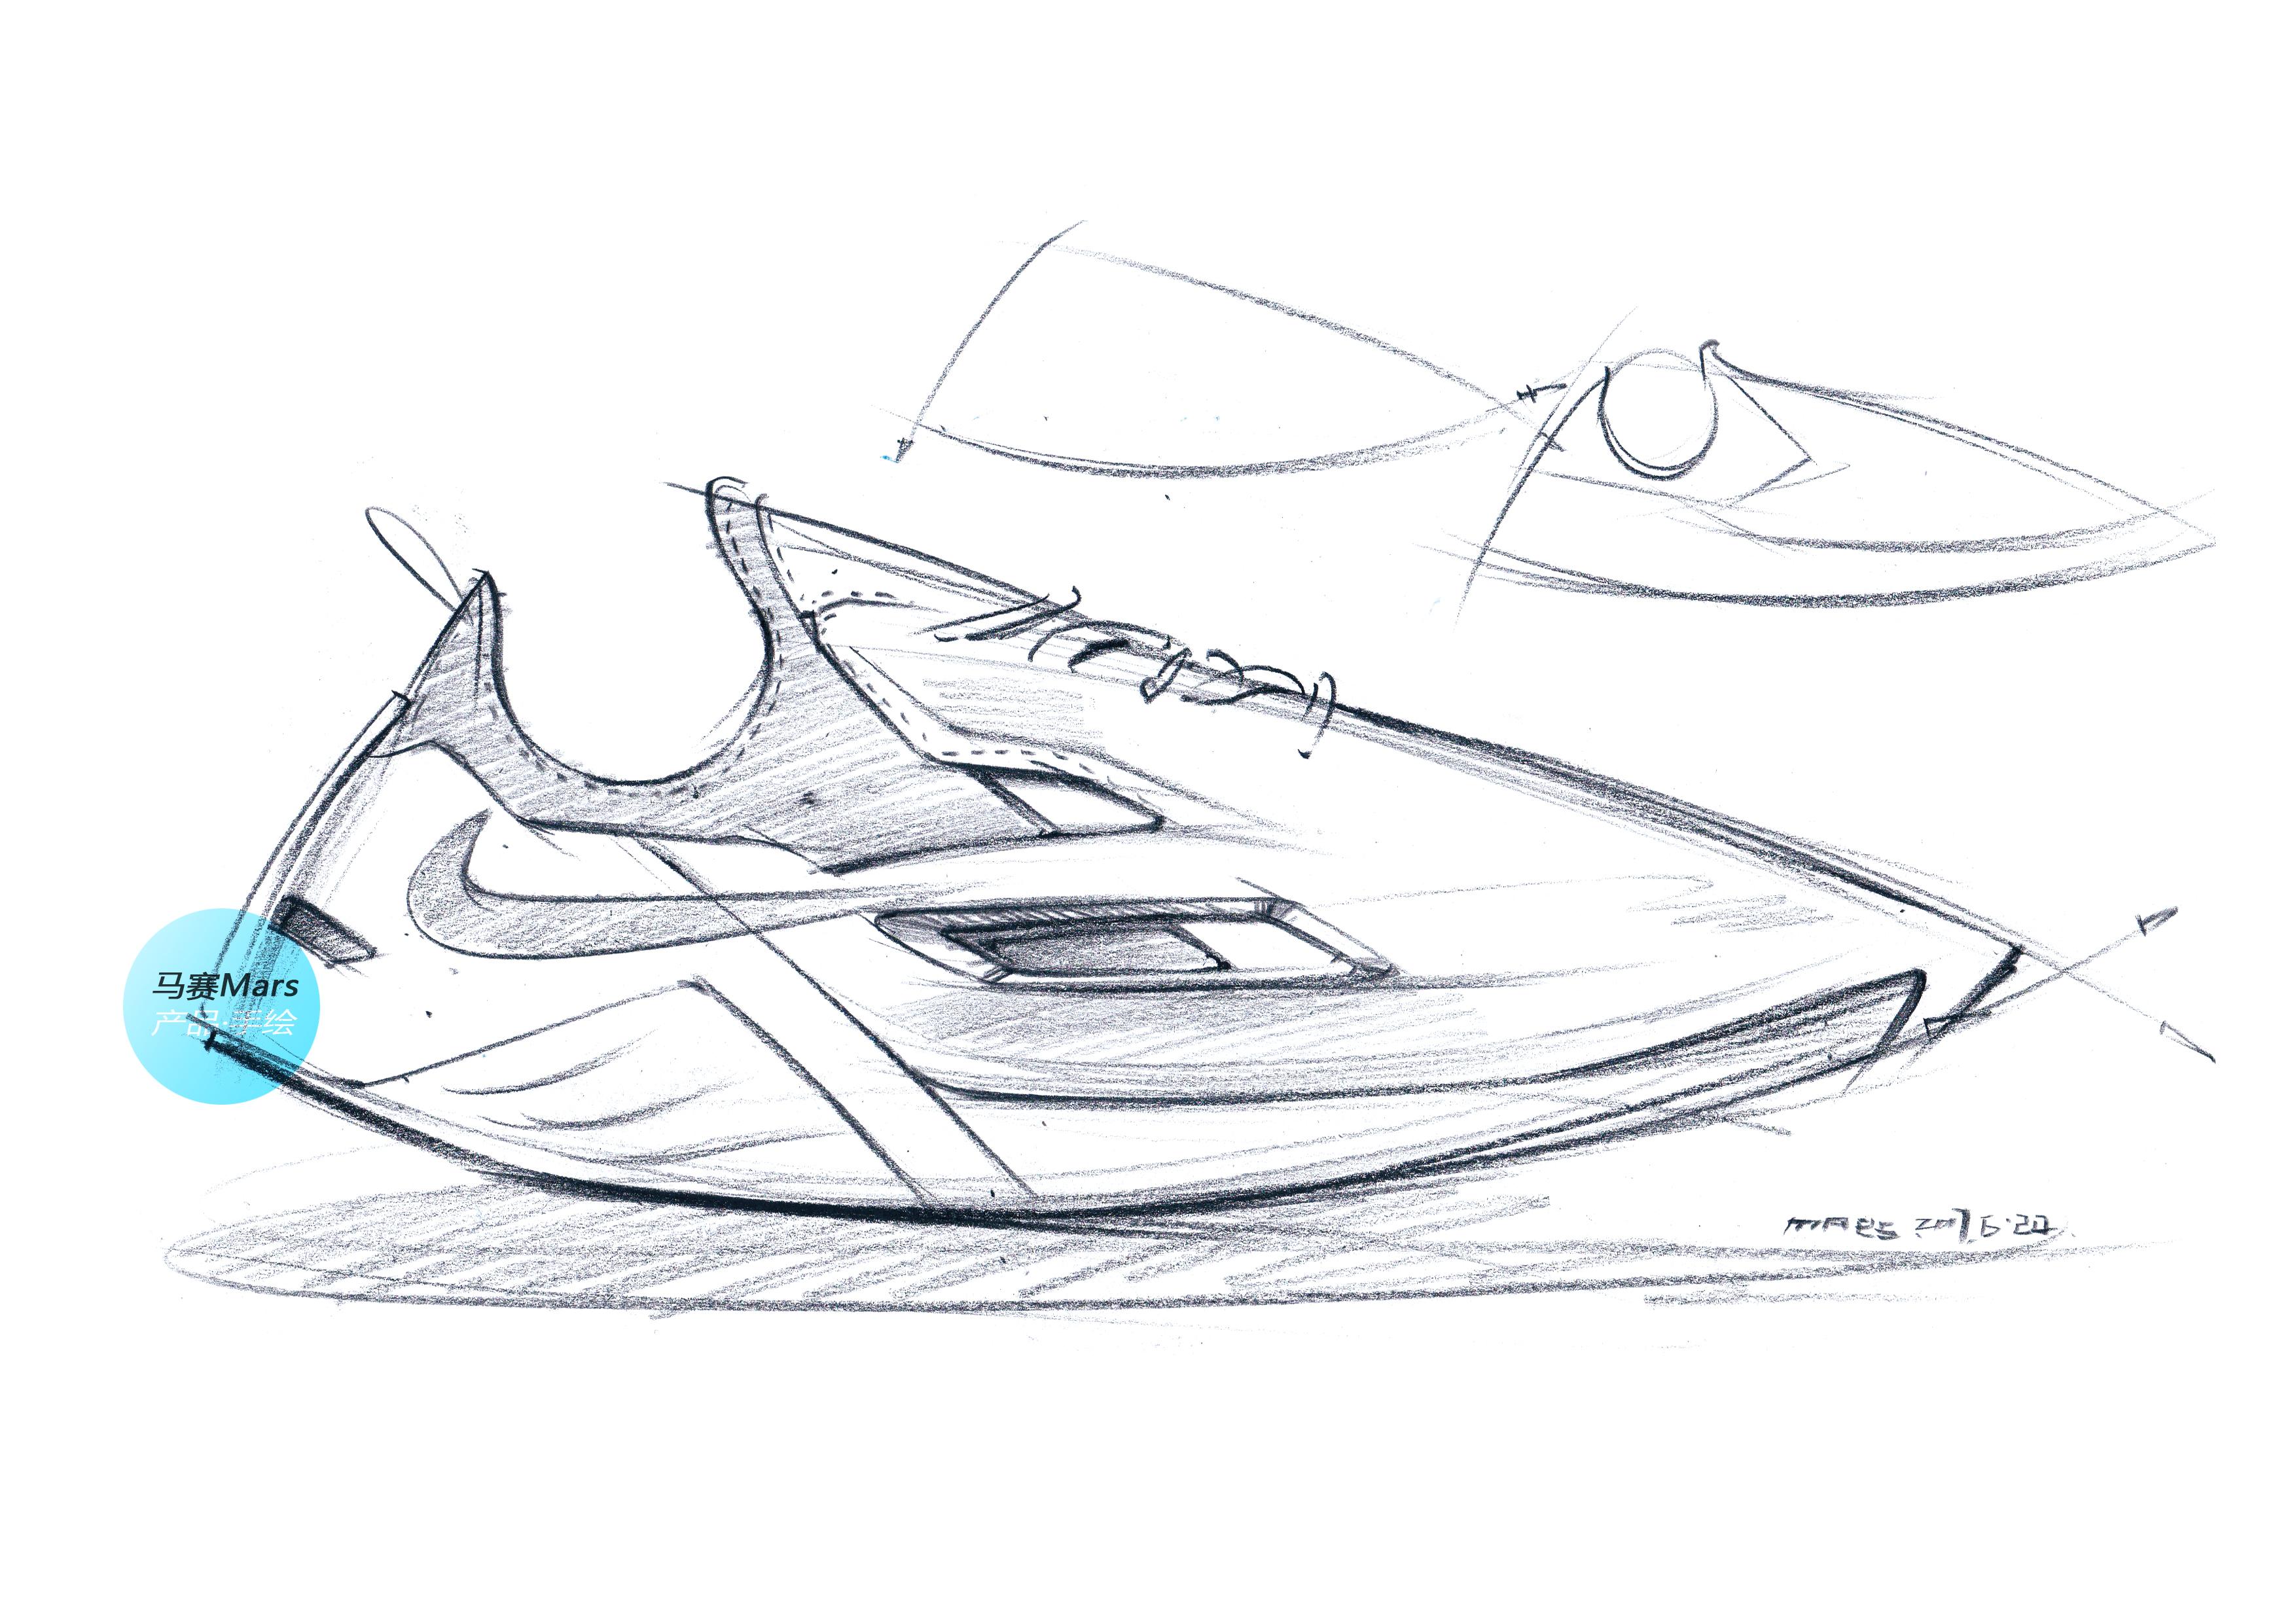 nike休闲运动鞋手绘—— 马赛(mars)作品|工业/产品